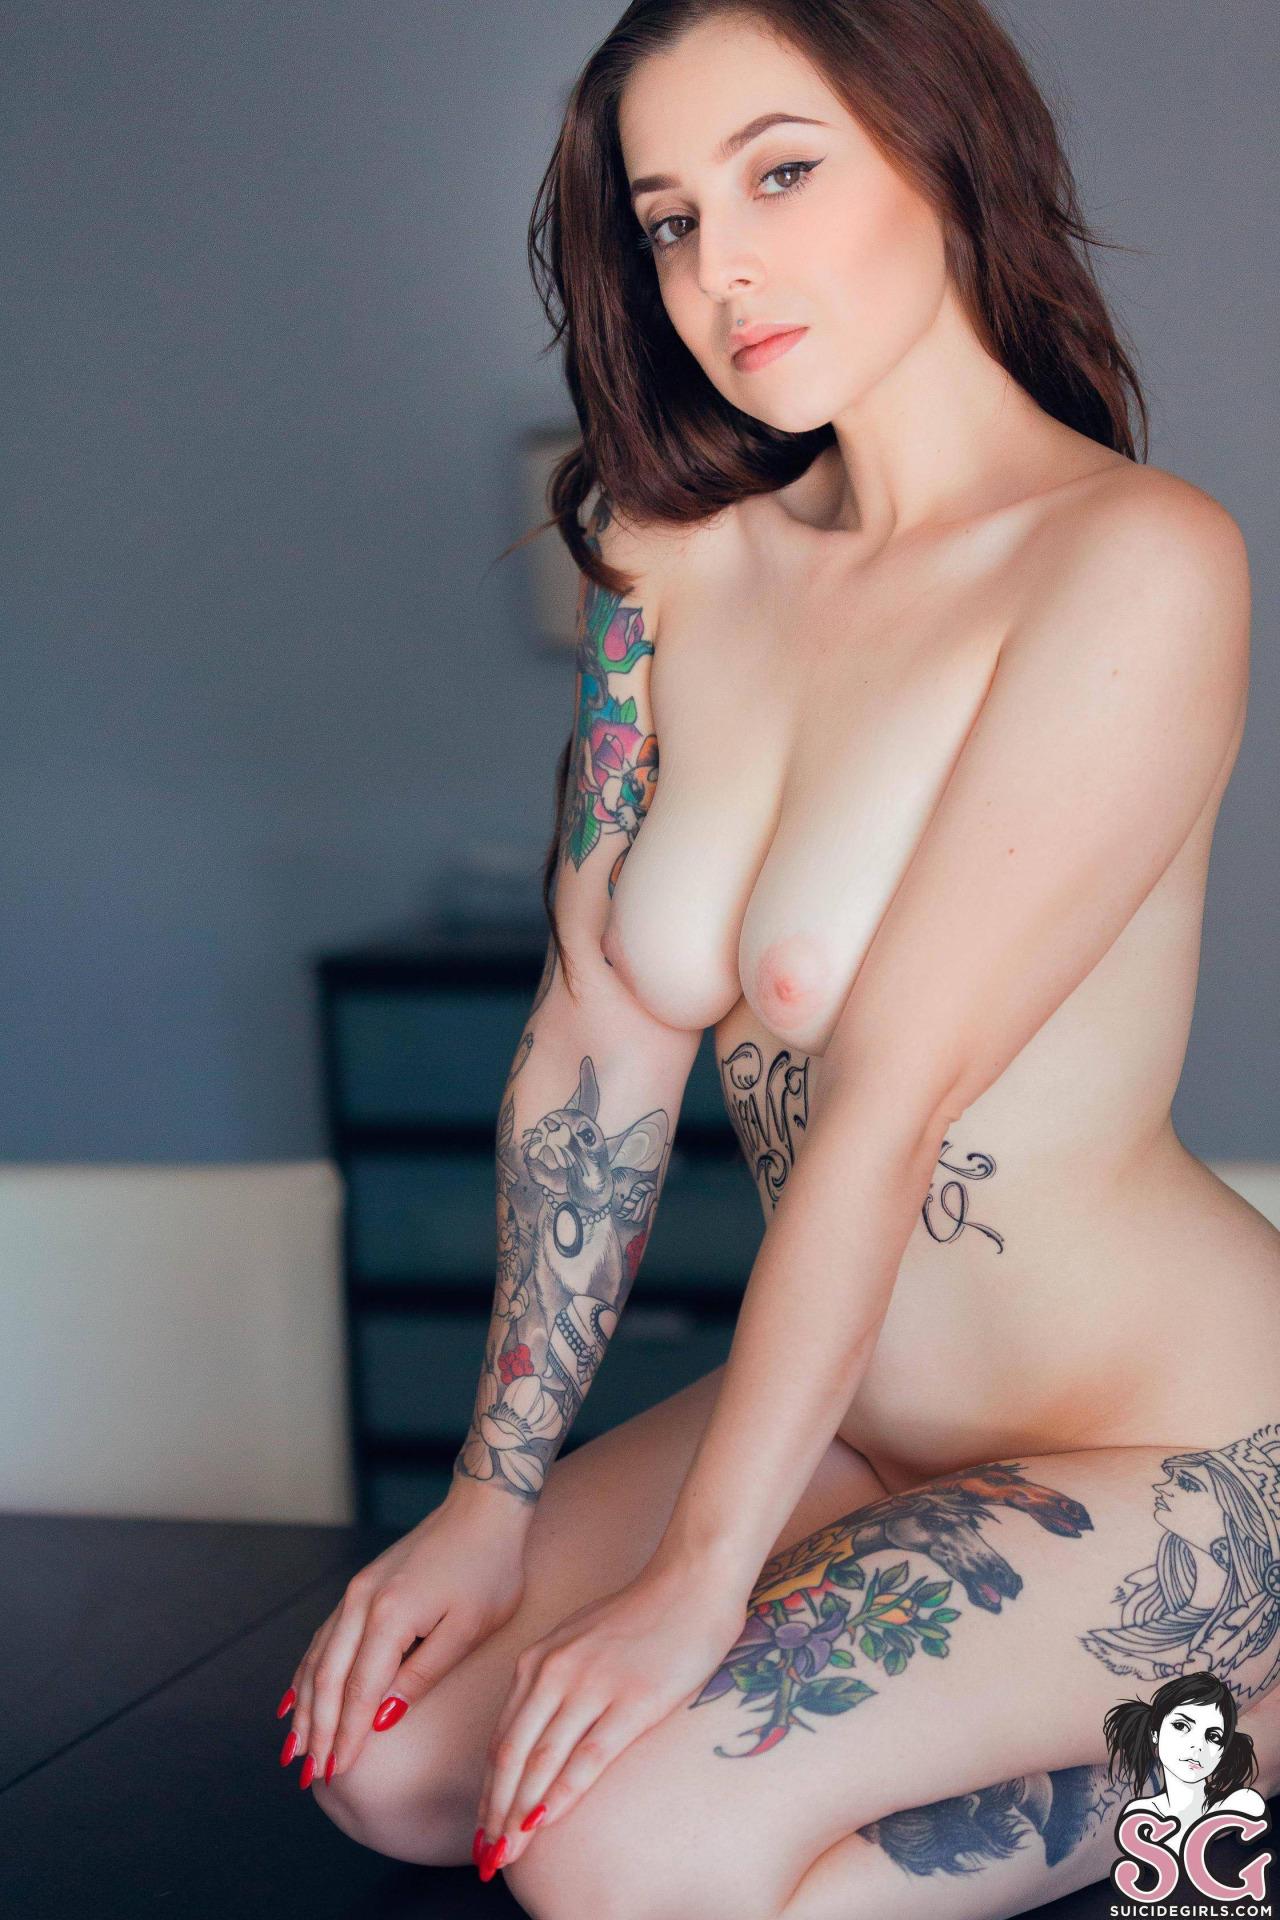 amateur-bedroom-vice-suicide-girls-nude